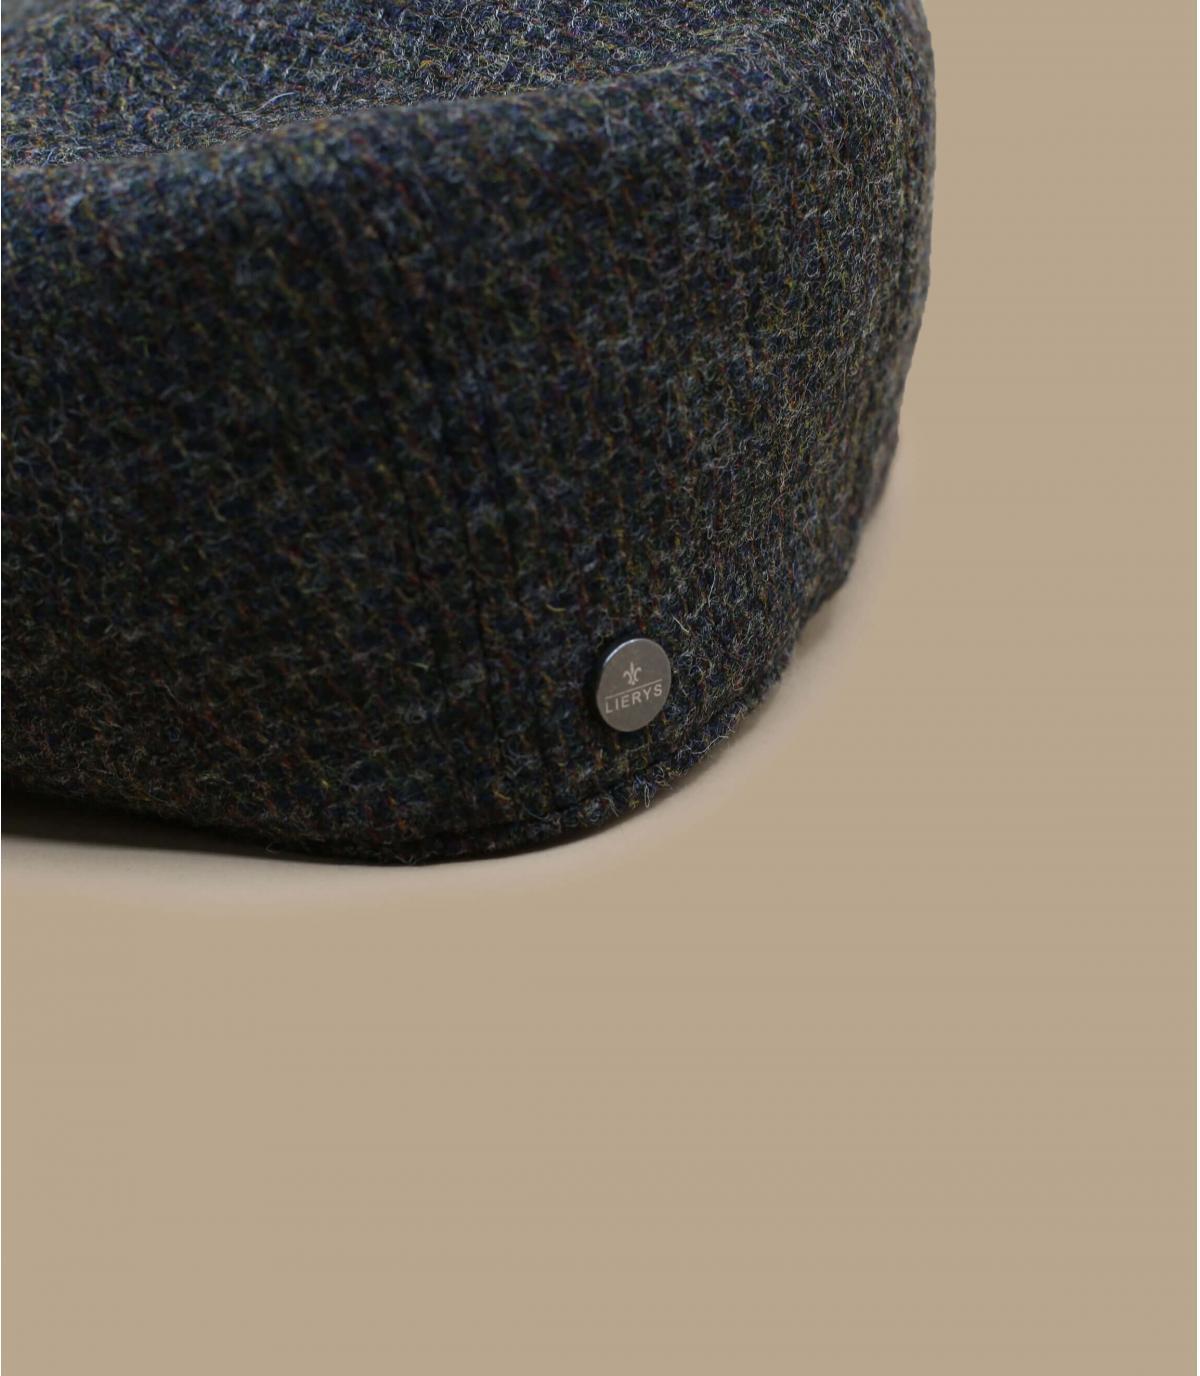 Détails Britton Wool grey - image 2